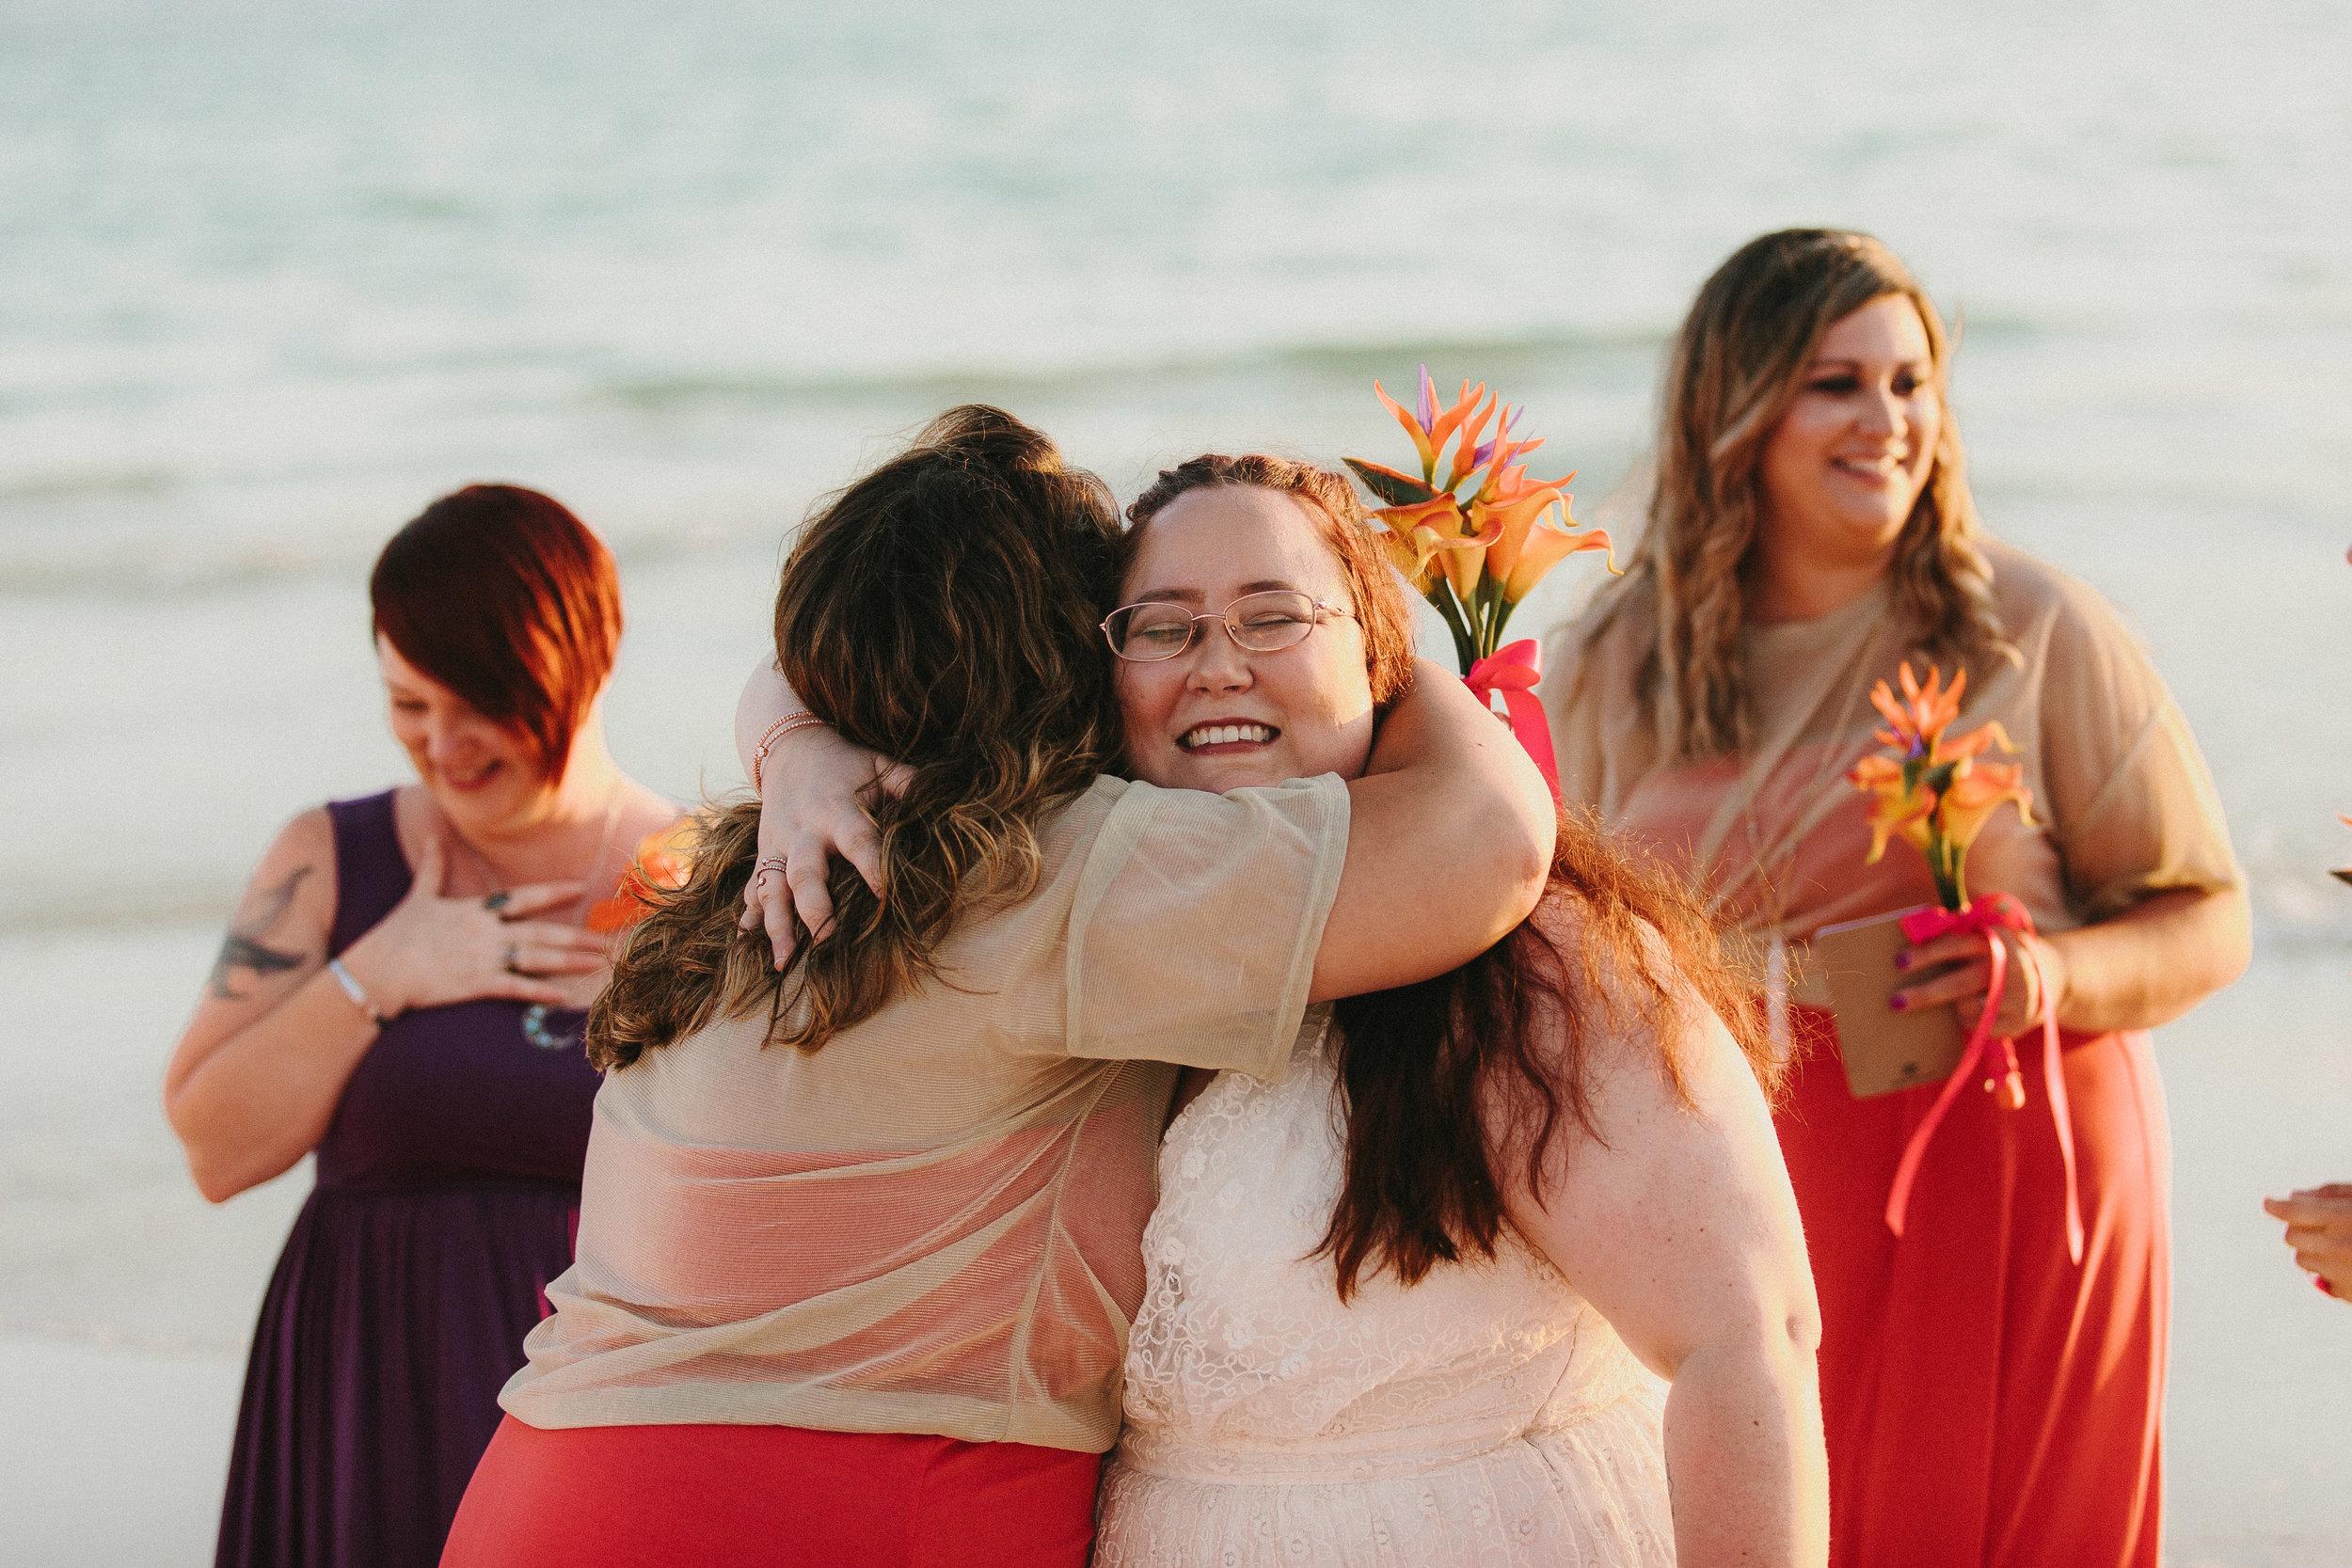 destin_sunset_beach_elopement_intimate_wedding_photographer_florida_documentary_1232.jpg